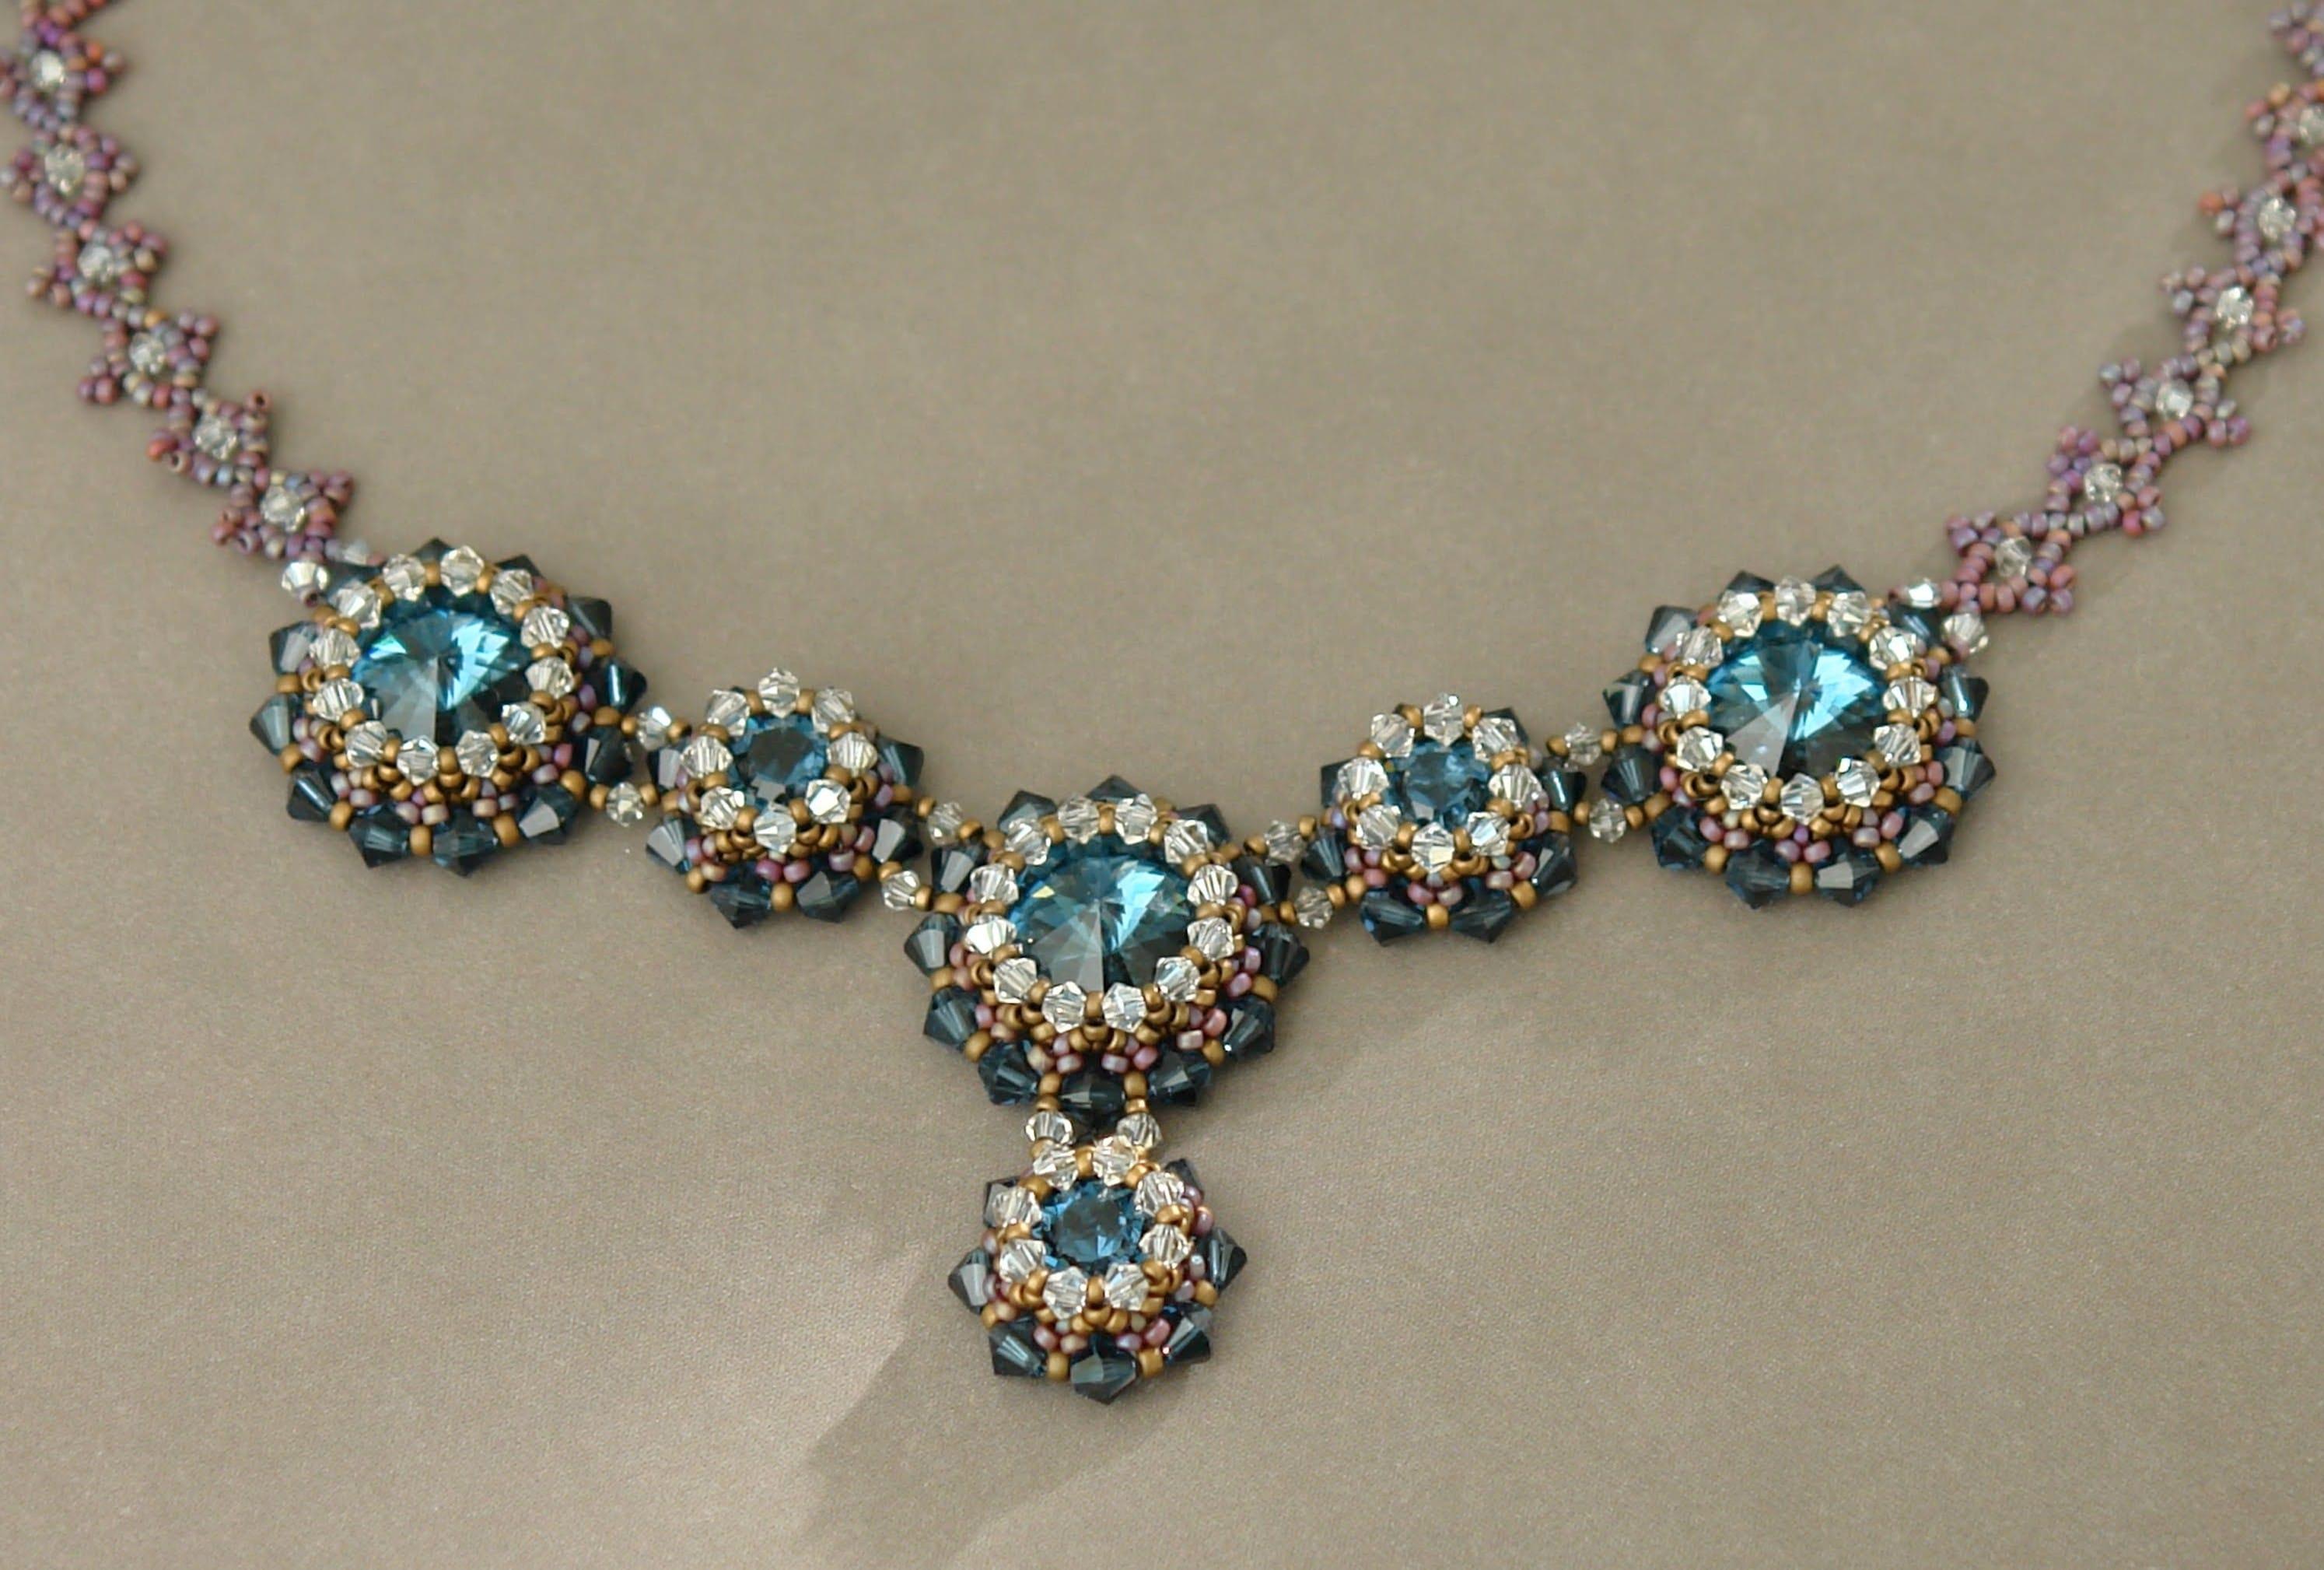 handmade jewelry idea